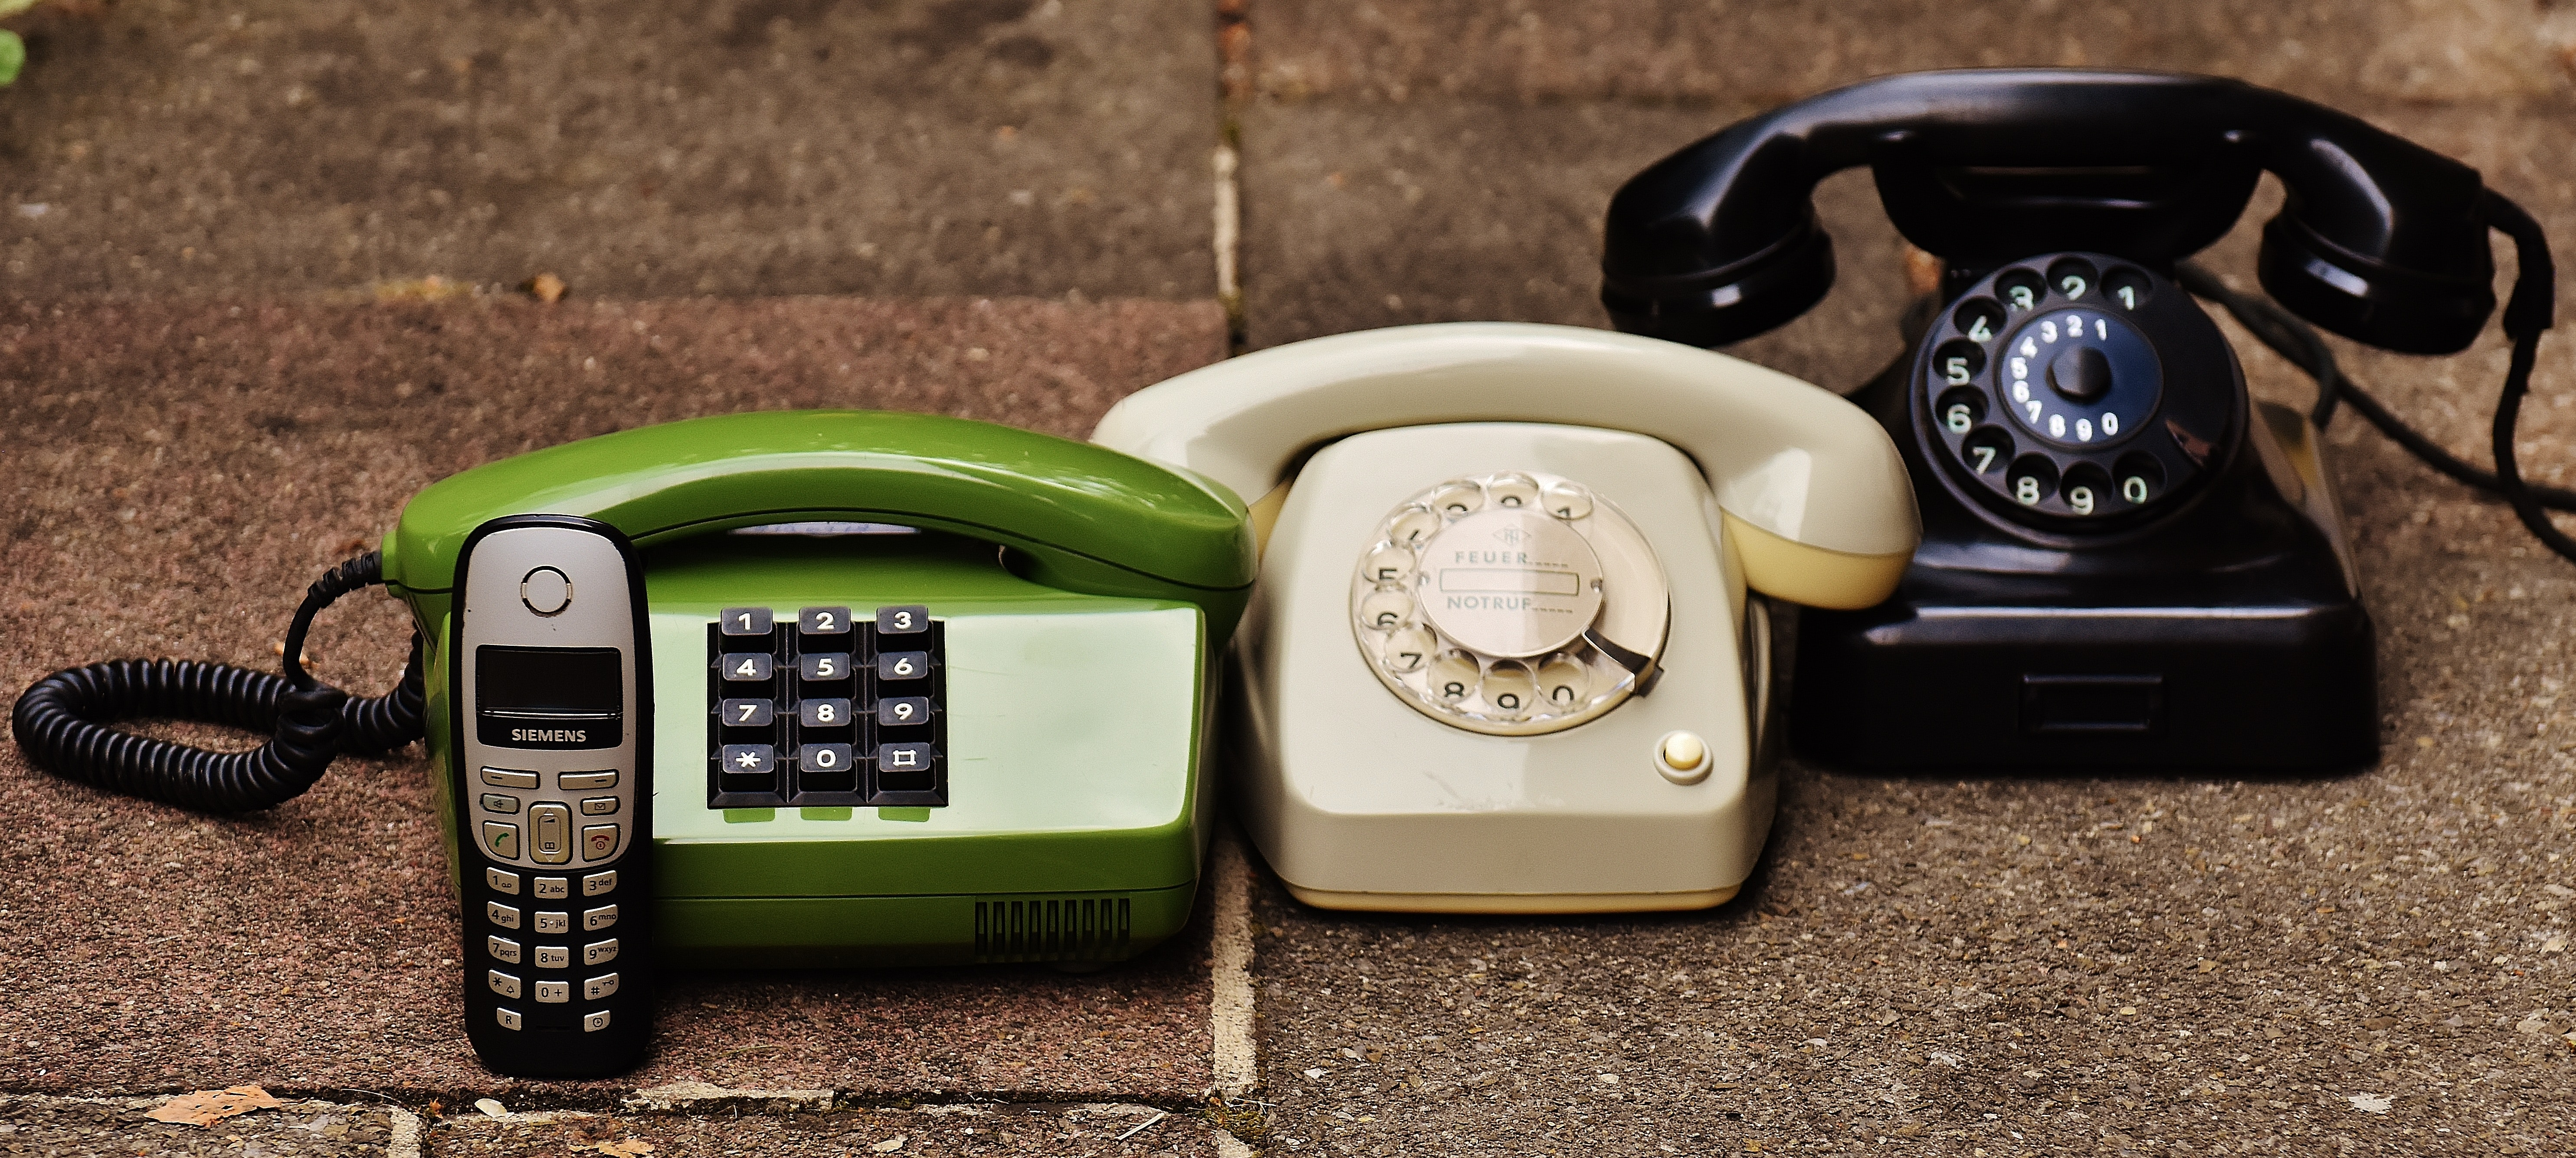 Black Rotary Phone, Antique, Obsolete, Telecommunication, Technology, HQ Photo